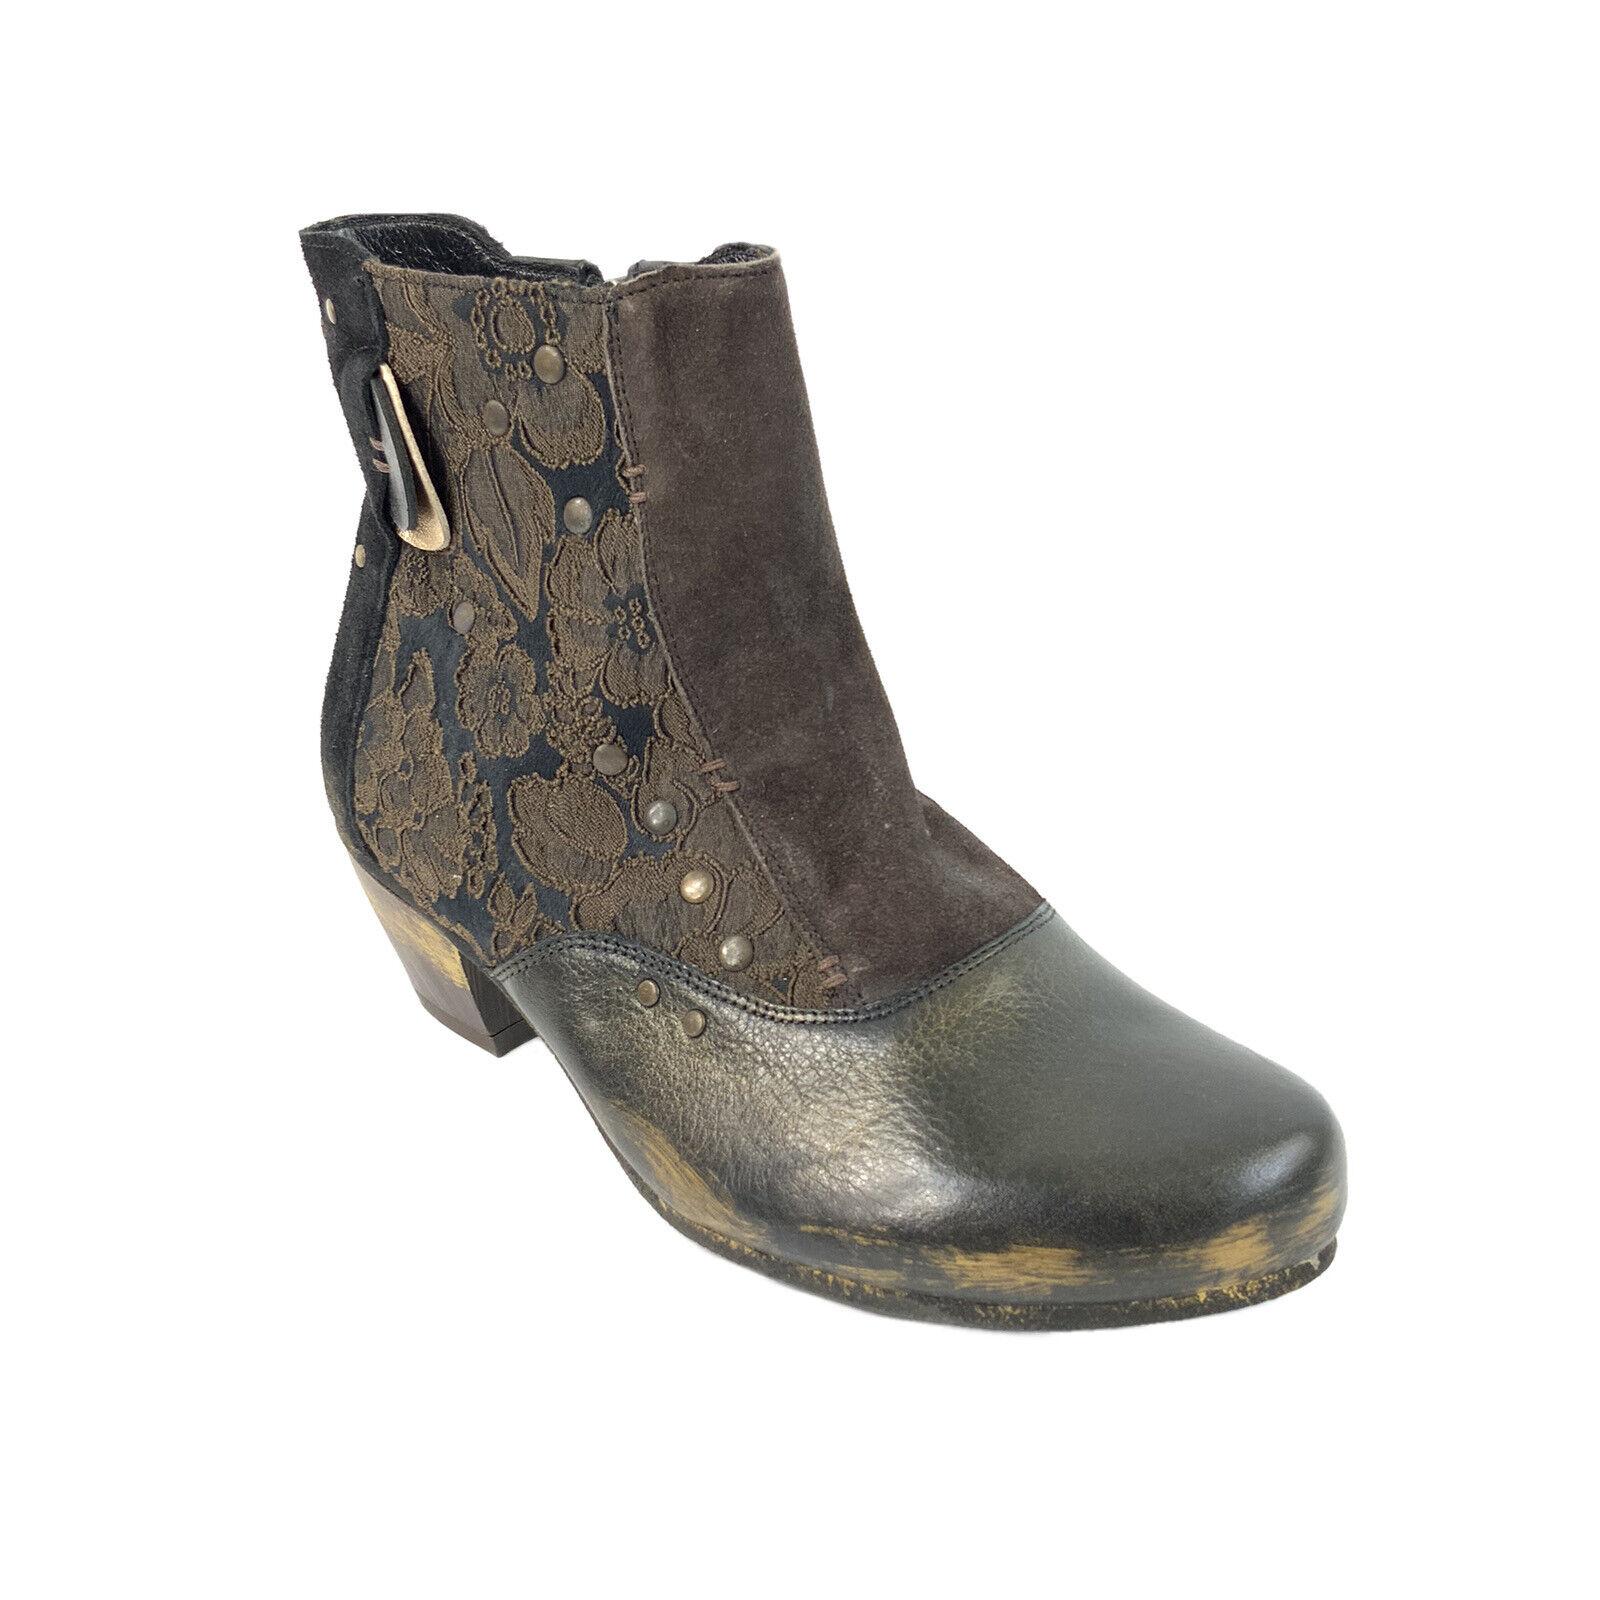 Maciejka Women's Size 37 Brown Leather Ankle Bootie